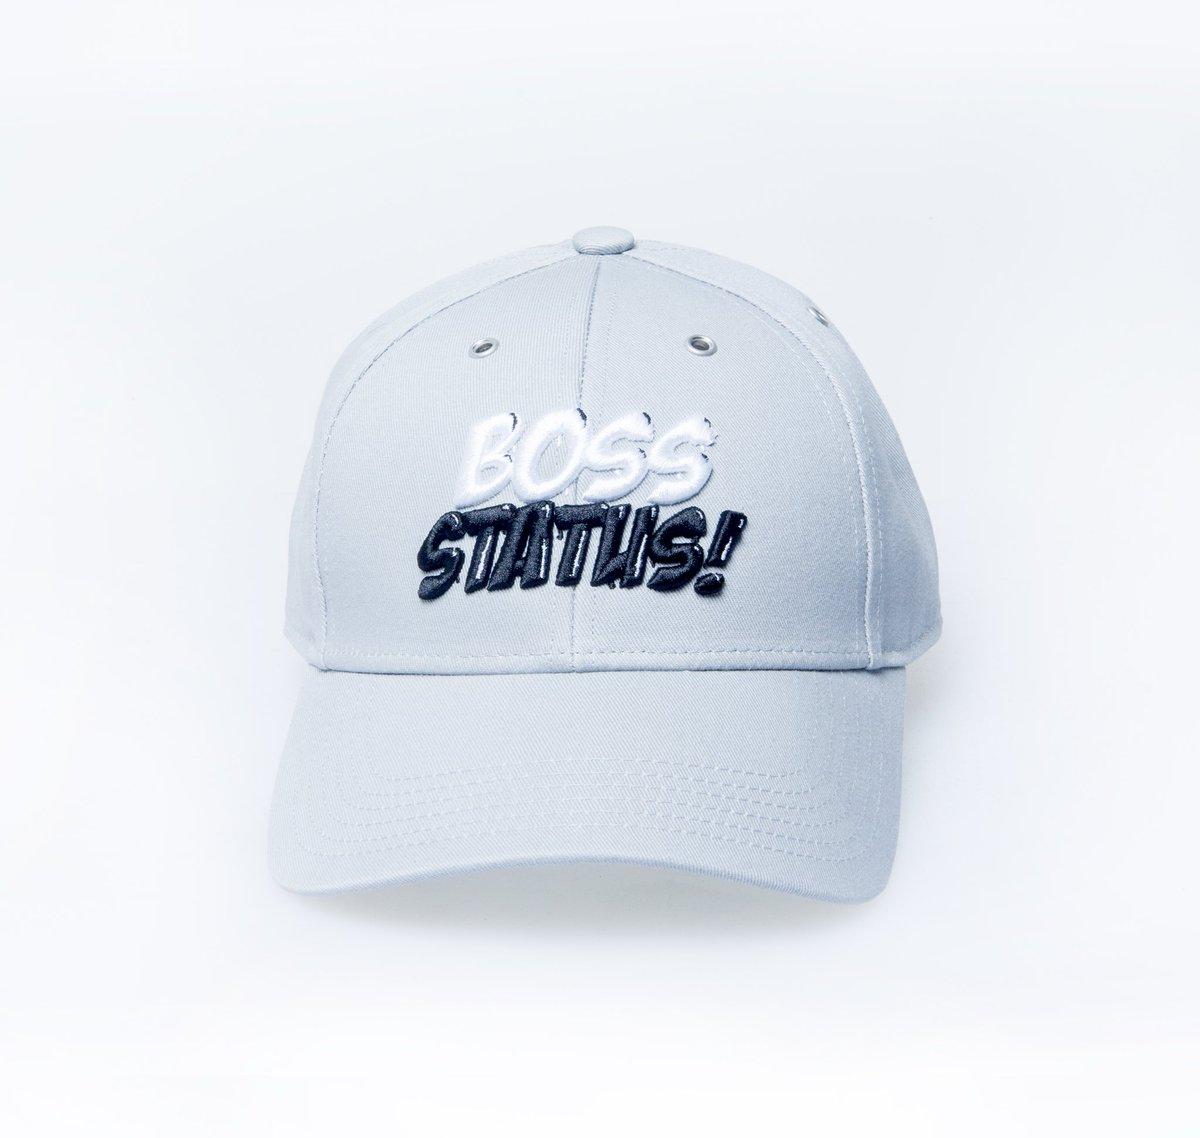 Boss Status Cap (Grey) https   bossstatus.co.uk products boss-status-cap- grey …pic.twitter.com y3XPpPLlQp ac2391556e5b